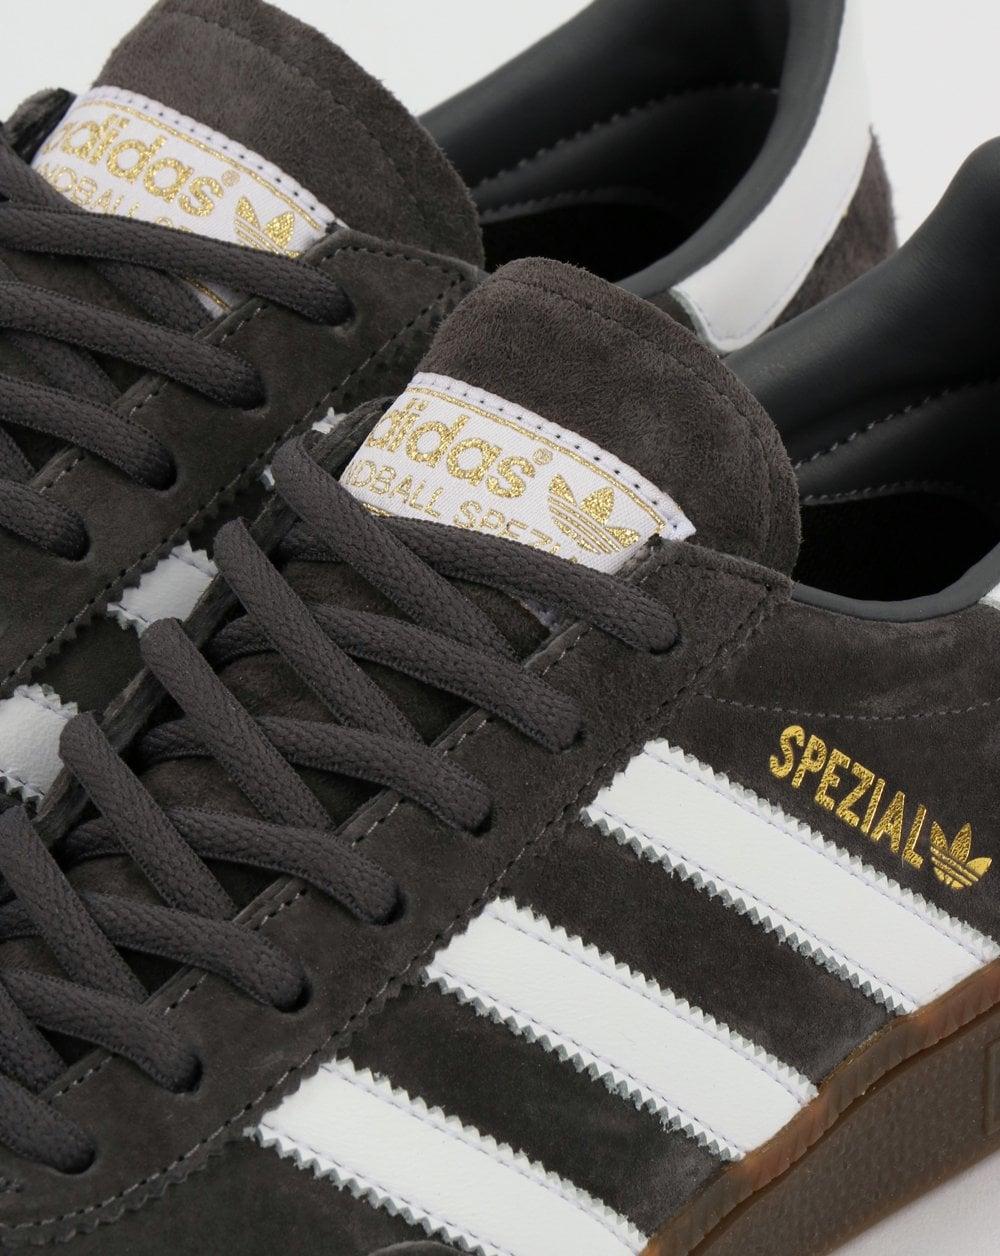 Adidas Spezial Trainers Grey,White